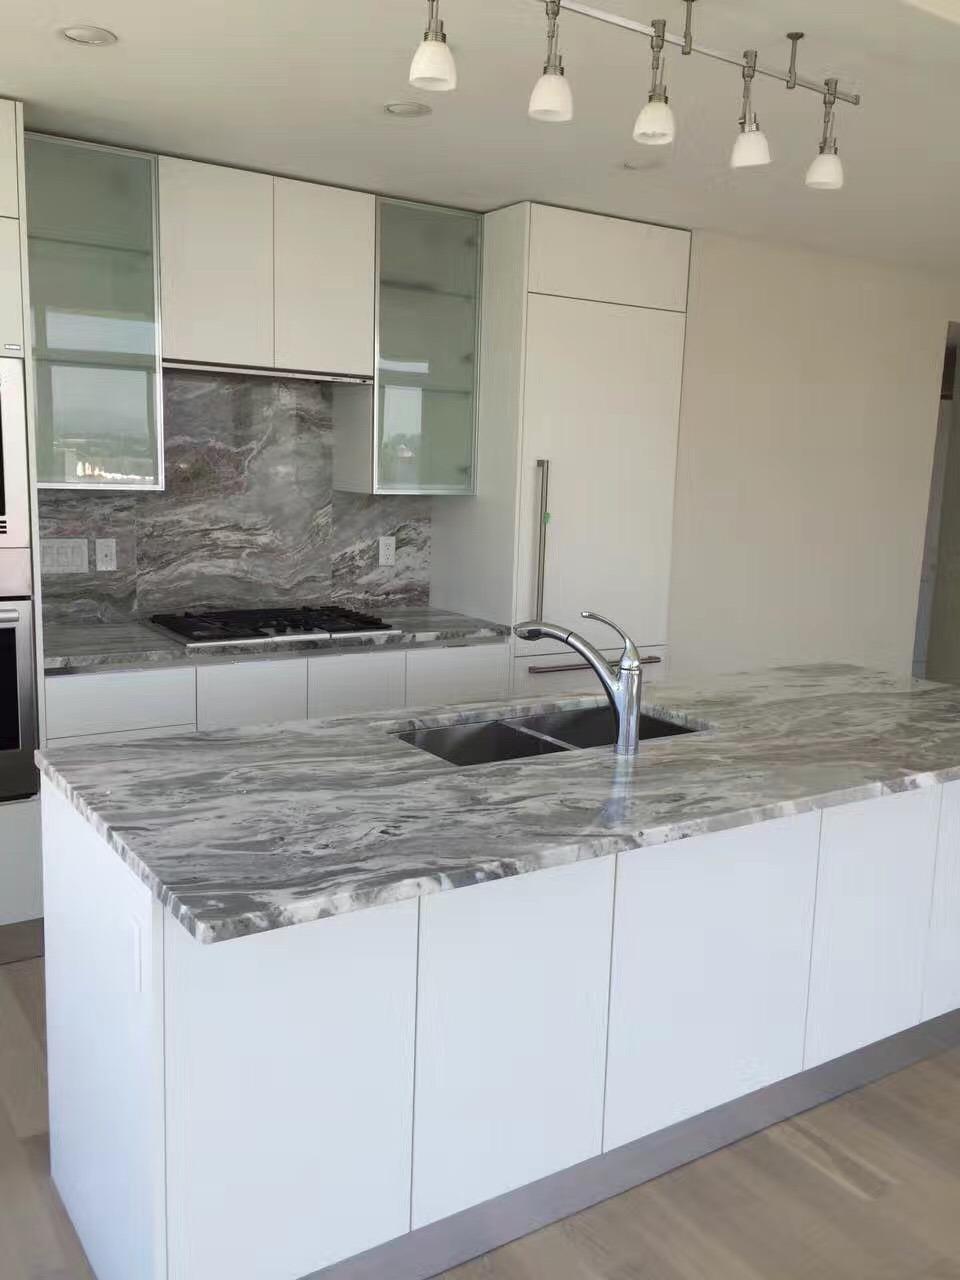 China Fantasy Brown Granite Kitchen Countertop Vanity Top China Granite Countertop Granite Kitchen Countertop